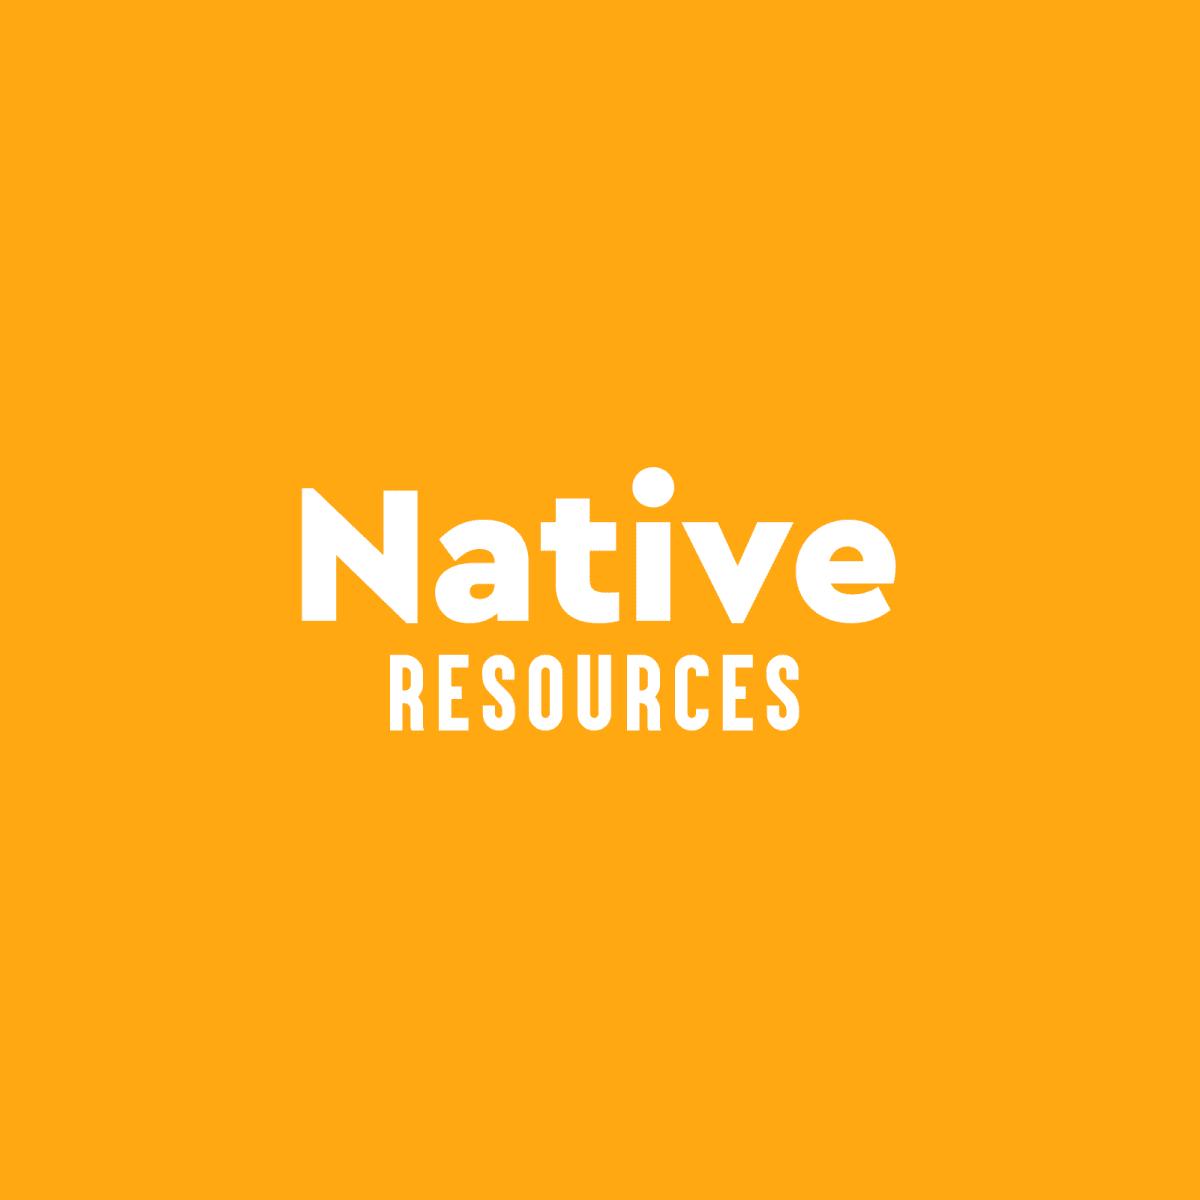 Image representing Native Resources